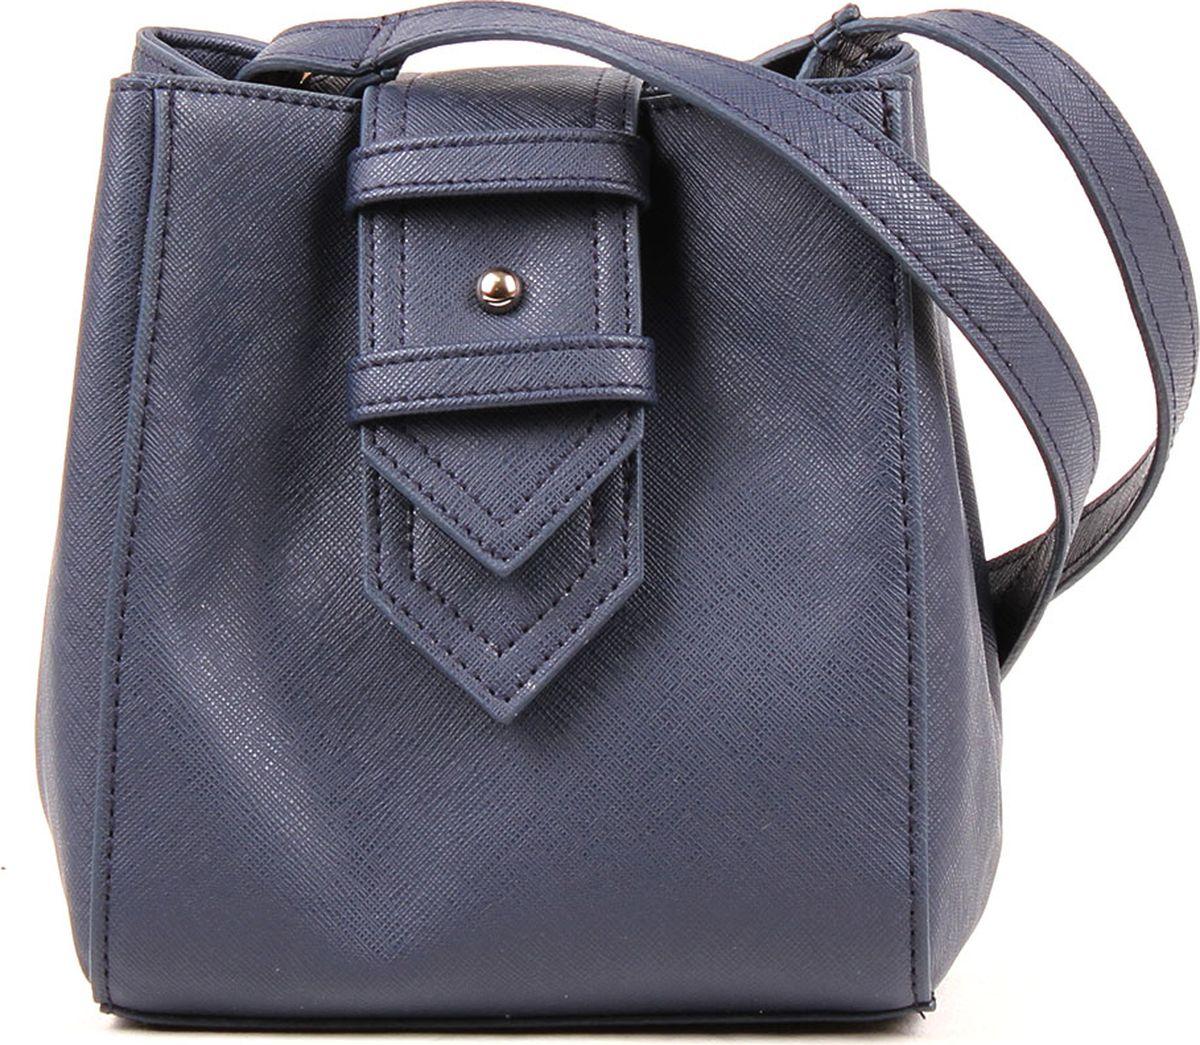 Сумка женская Медведково, 19с0097-к14, темно-синий сумка шоппер женская медведково цвет темно синий 16с3492 к14